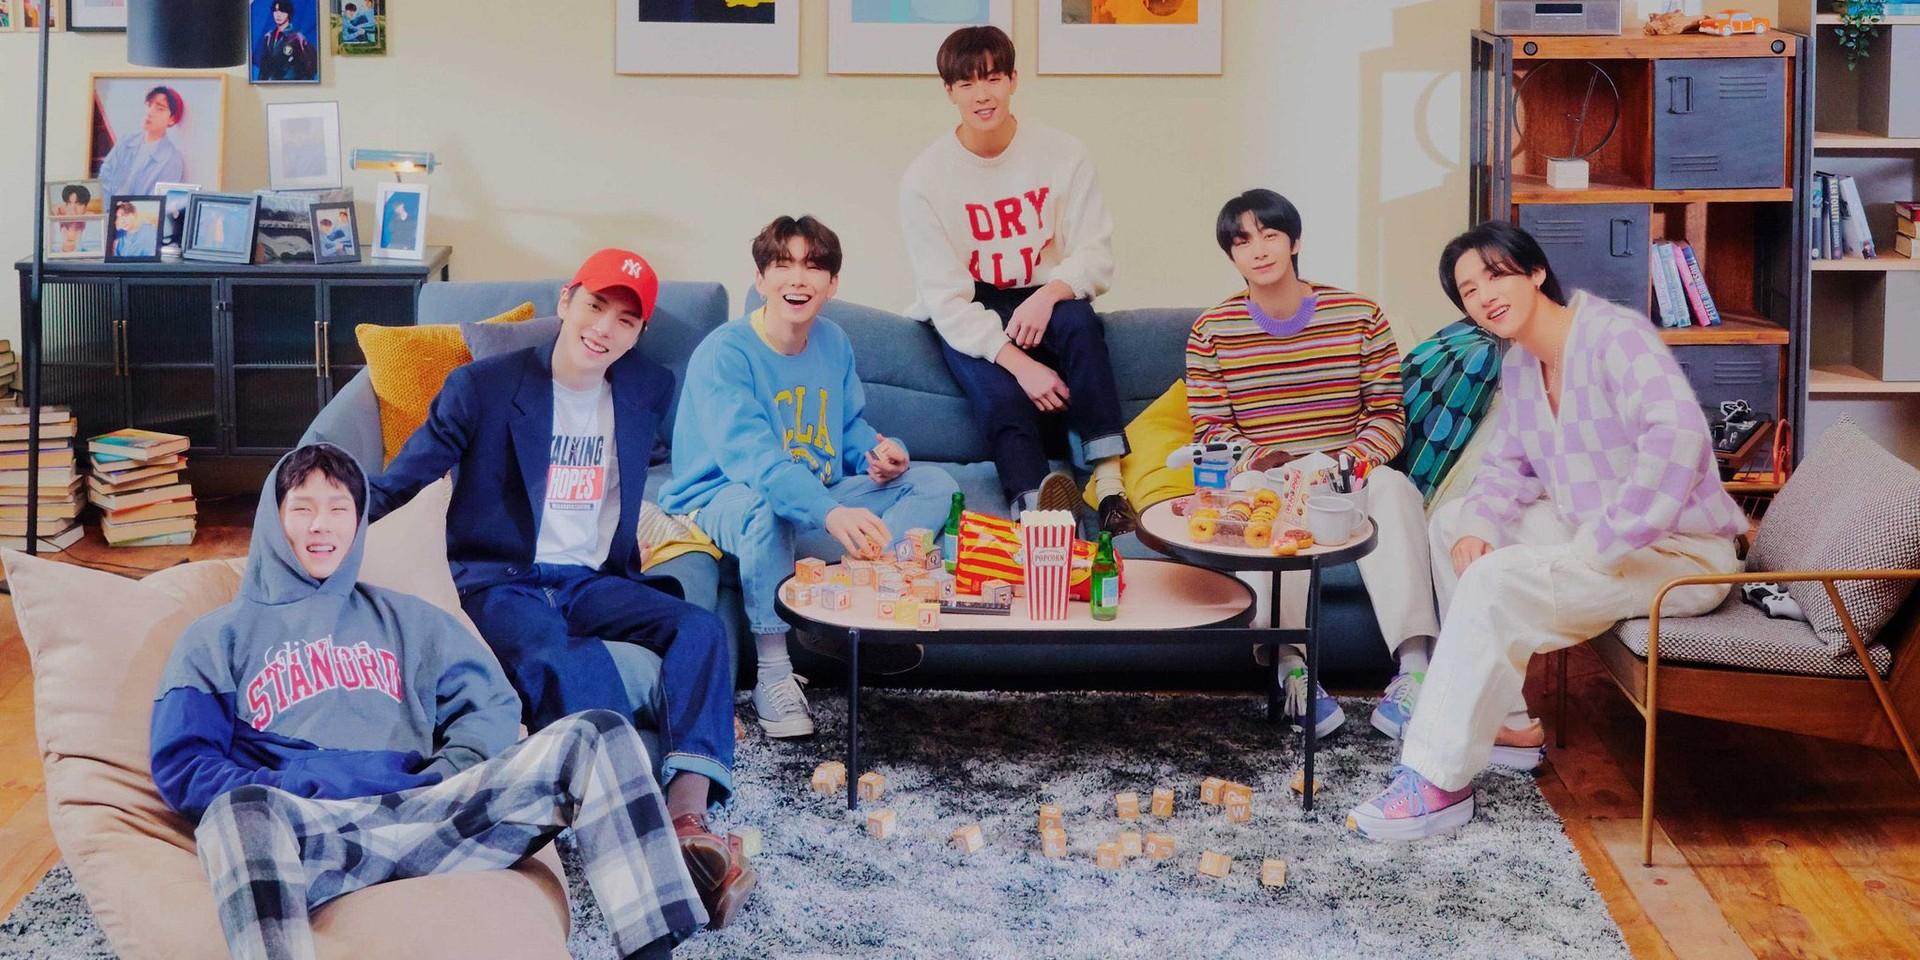 MONSTA X release Japanese album, 'Flavors of love' – listen